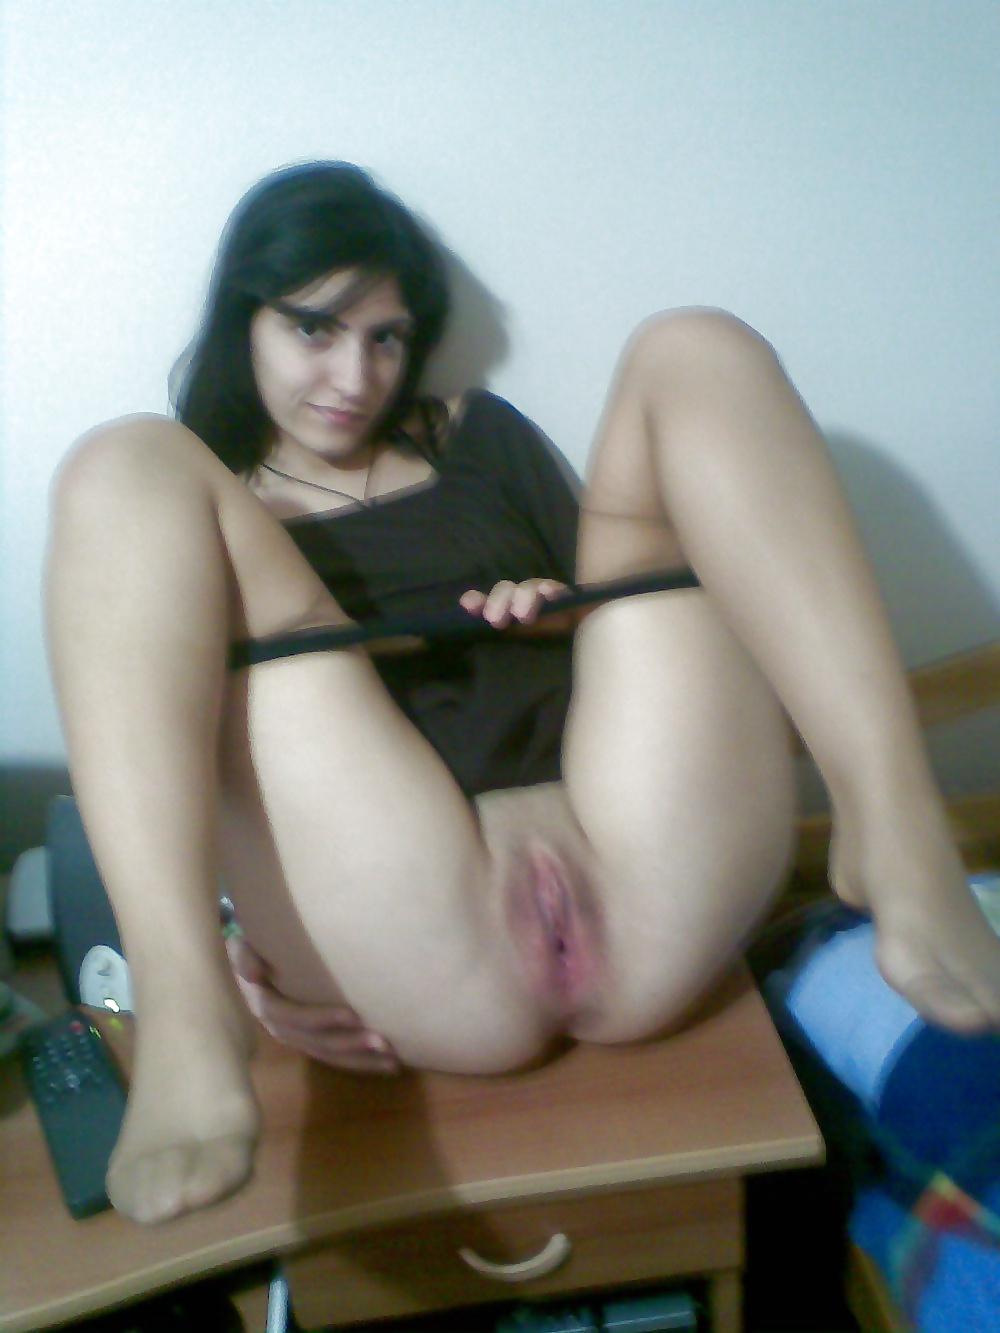 seksi kaupat hairy pussies